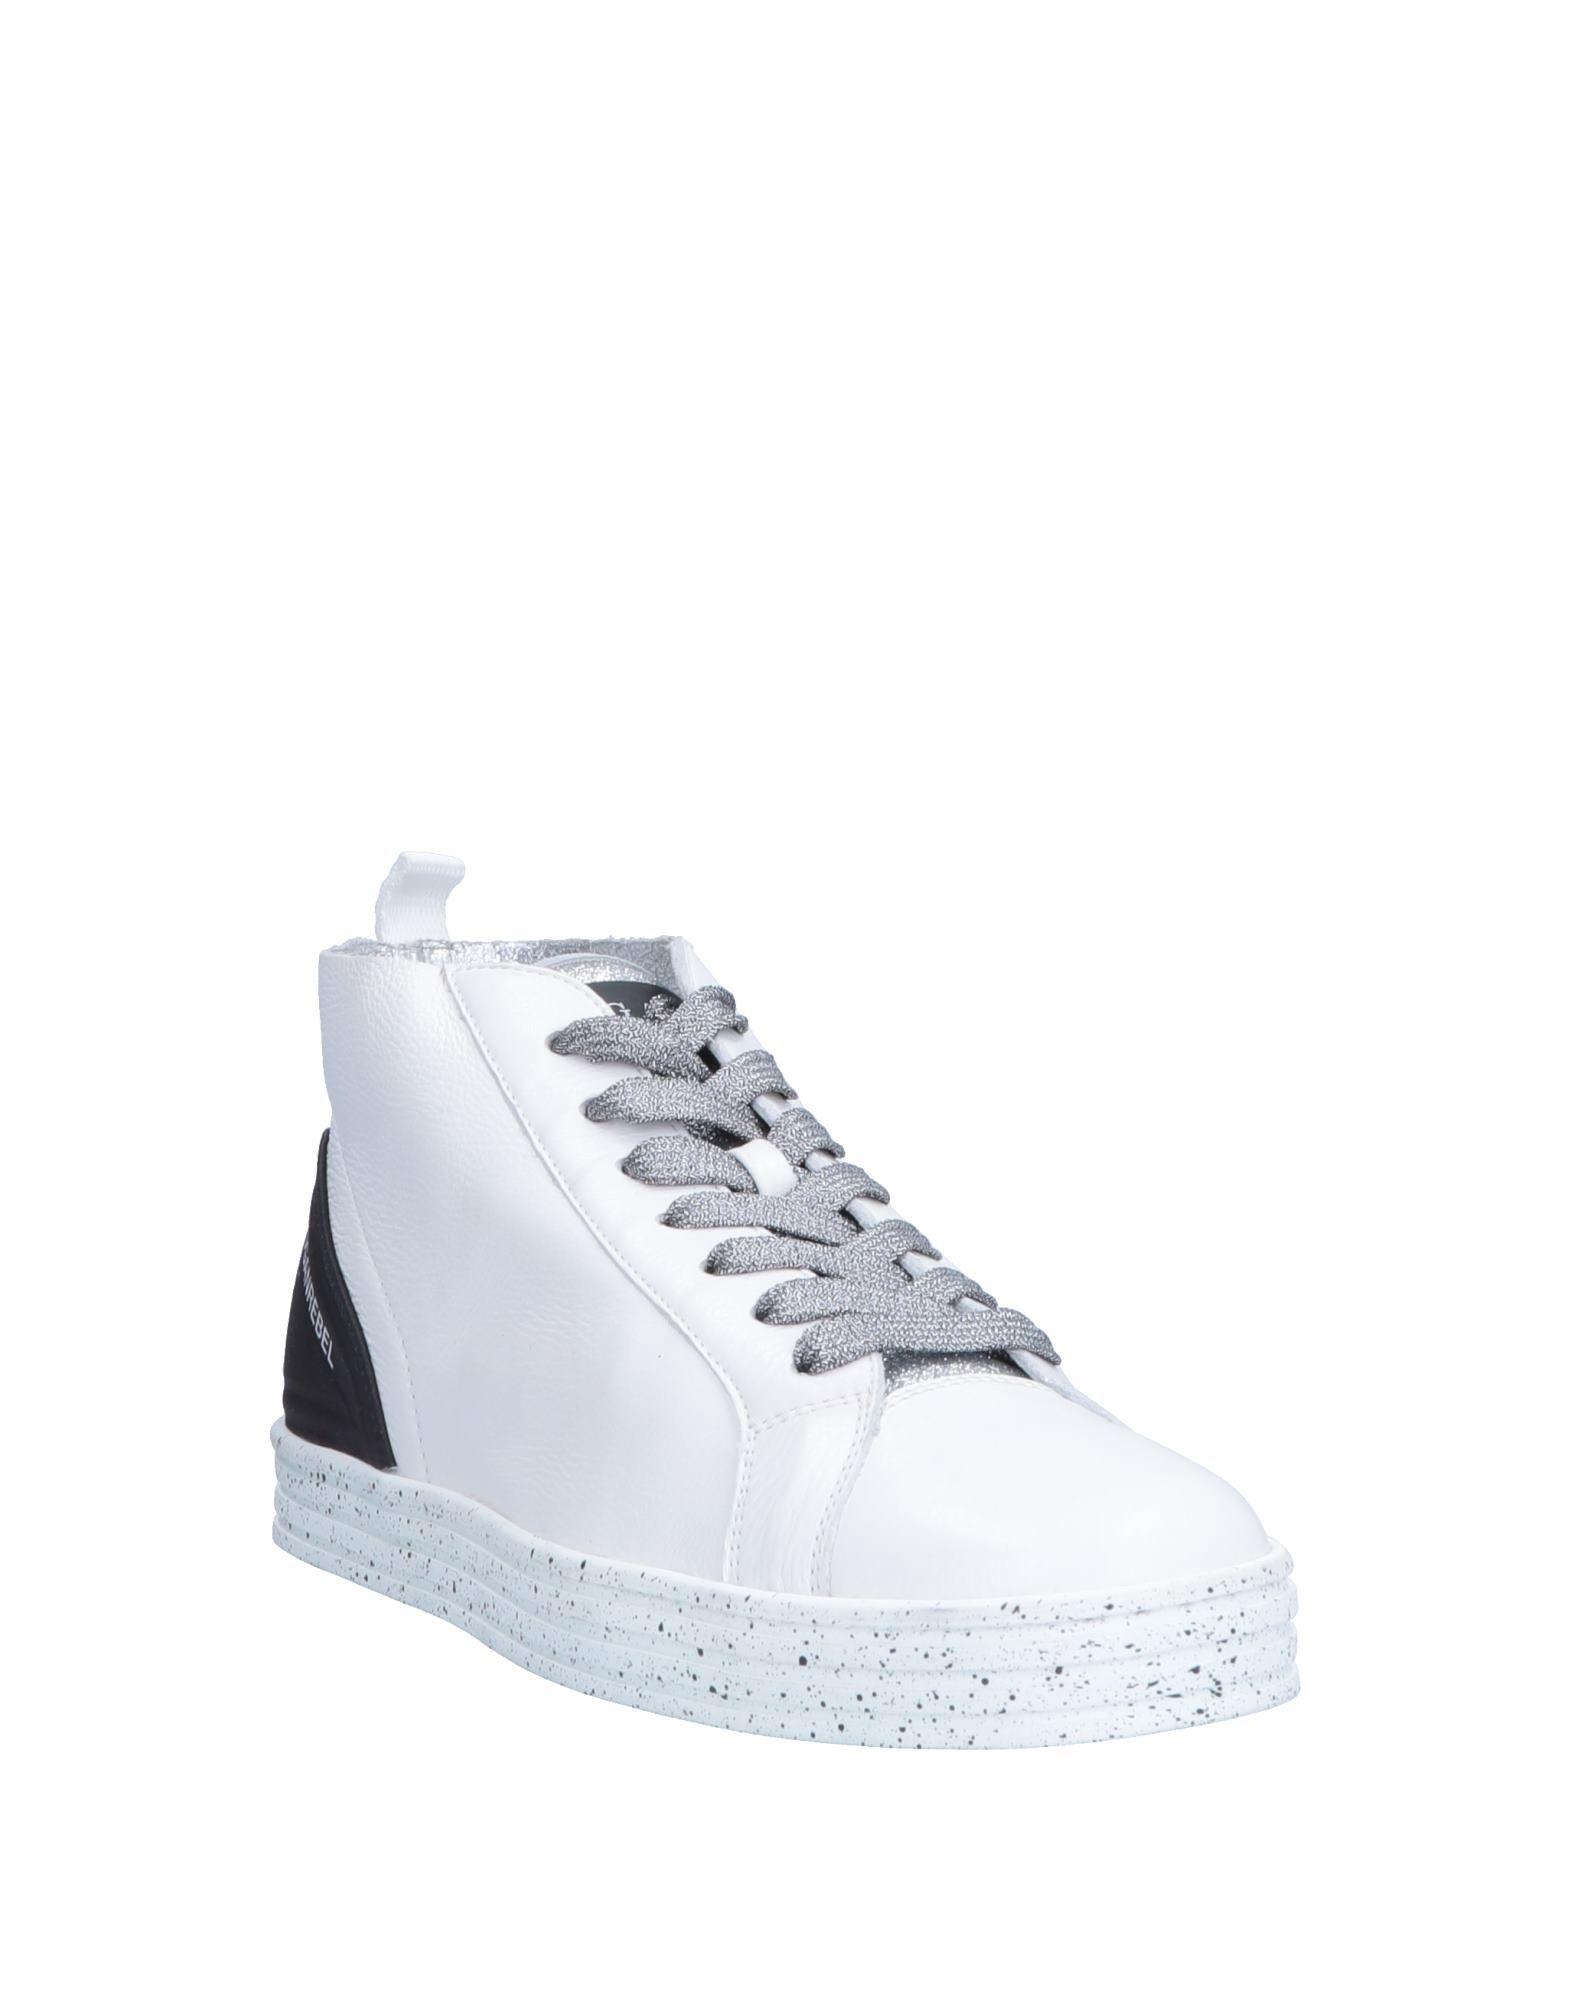 Stilvolle billige Schuhe Damen Hogan Rebel Sneakers Damen Schuhe  11564688VK cfd5e9